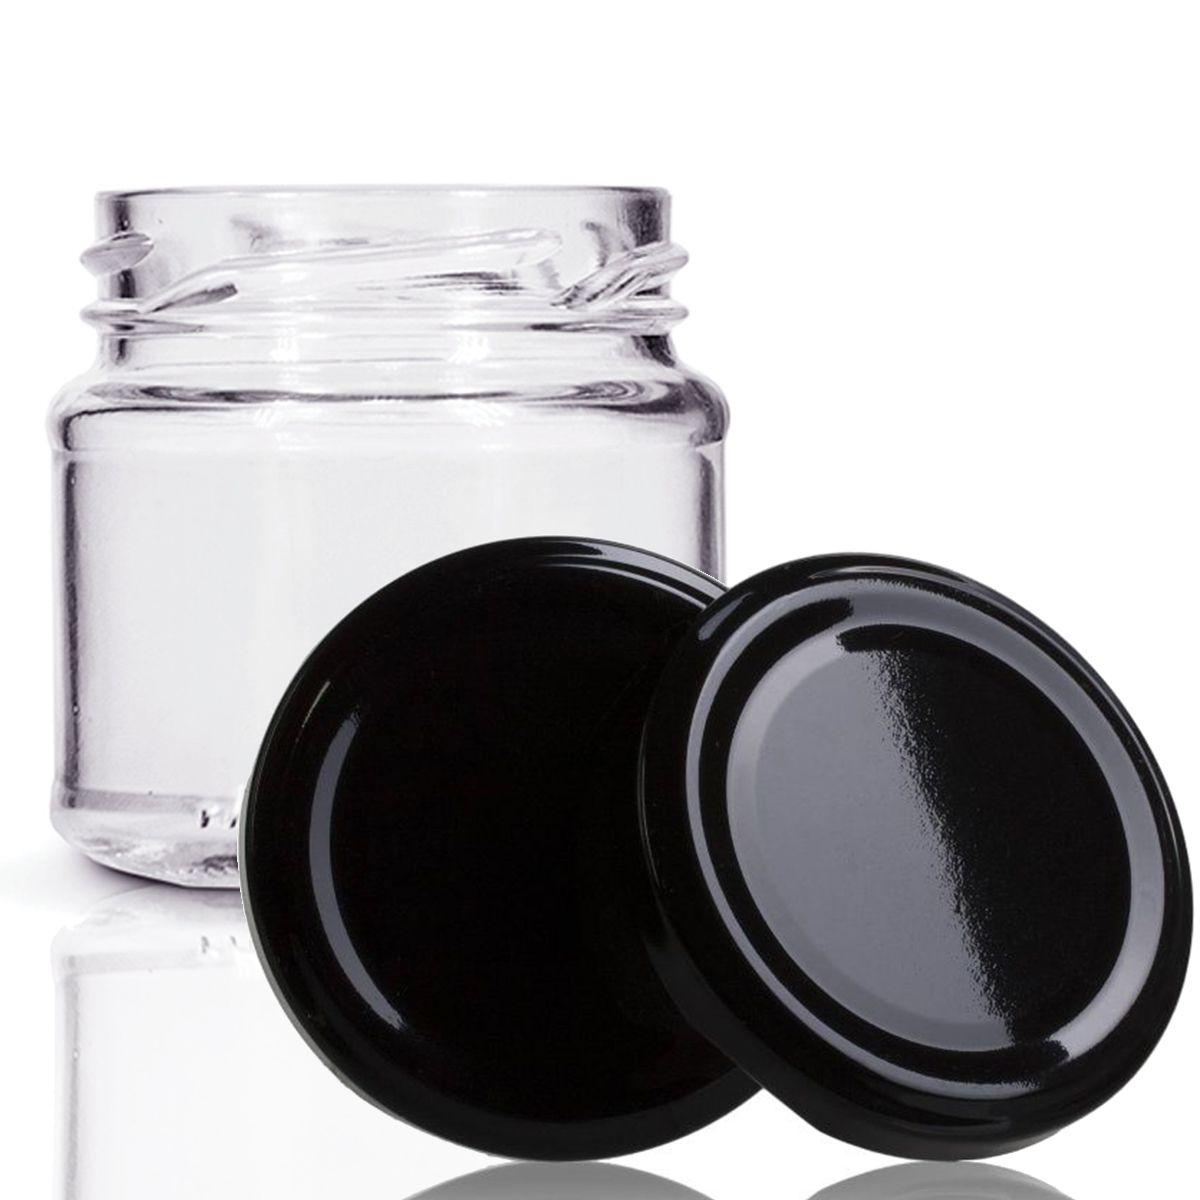 48 Potes De Vidro Mini Belém 150 Ml Tampa Preta + Lacre  - EMPÓRIO PACK